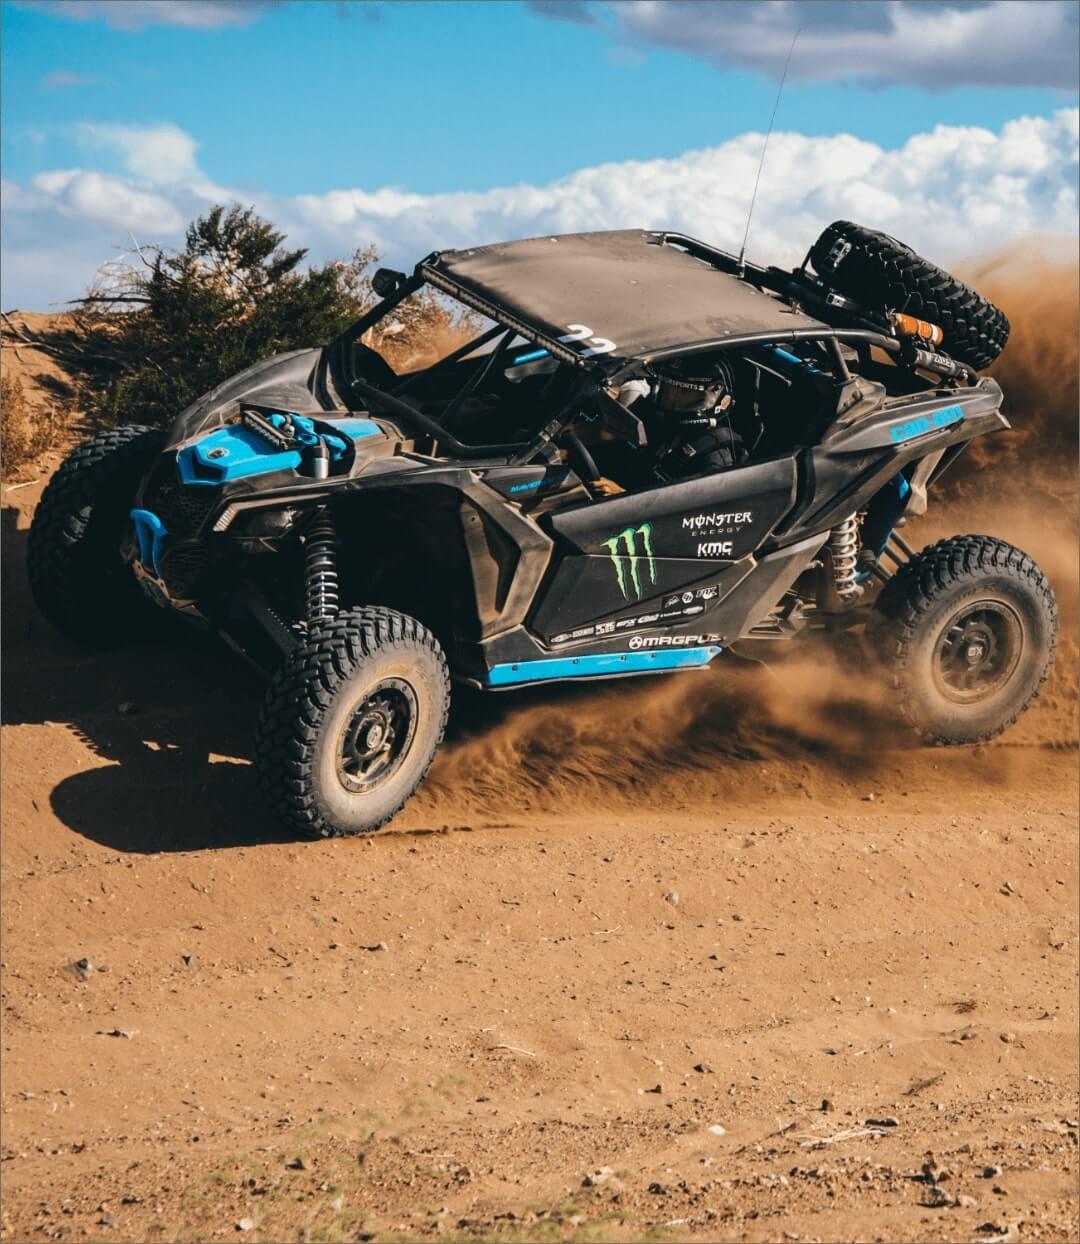 Black and Blue Can-Am Maverick X3 UTV kicking up dirt on a track